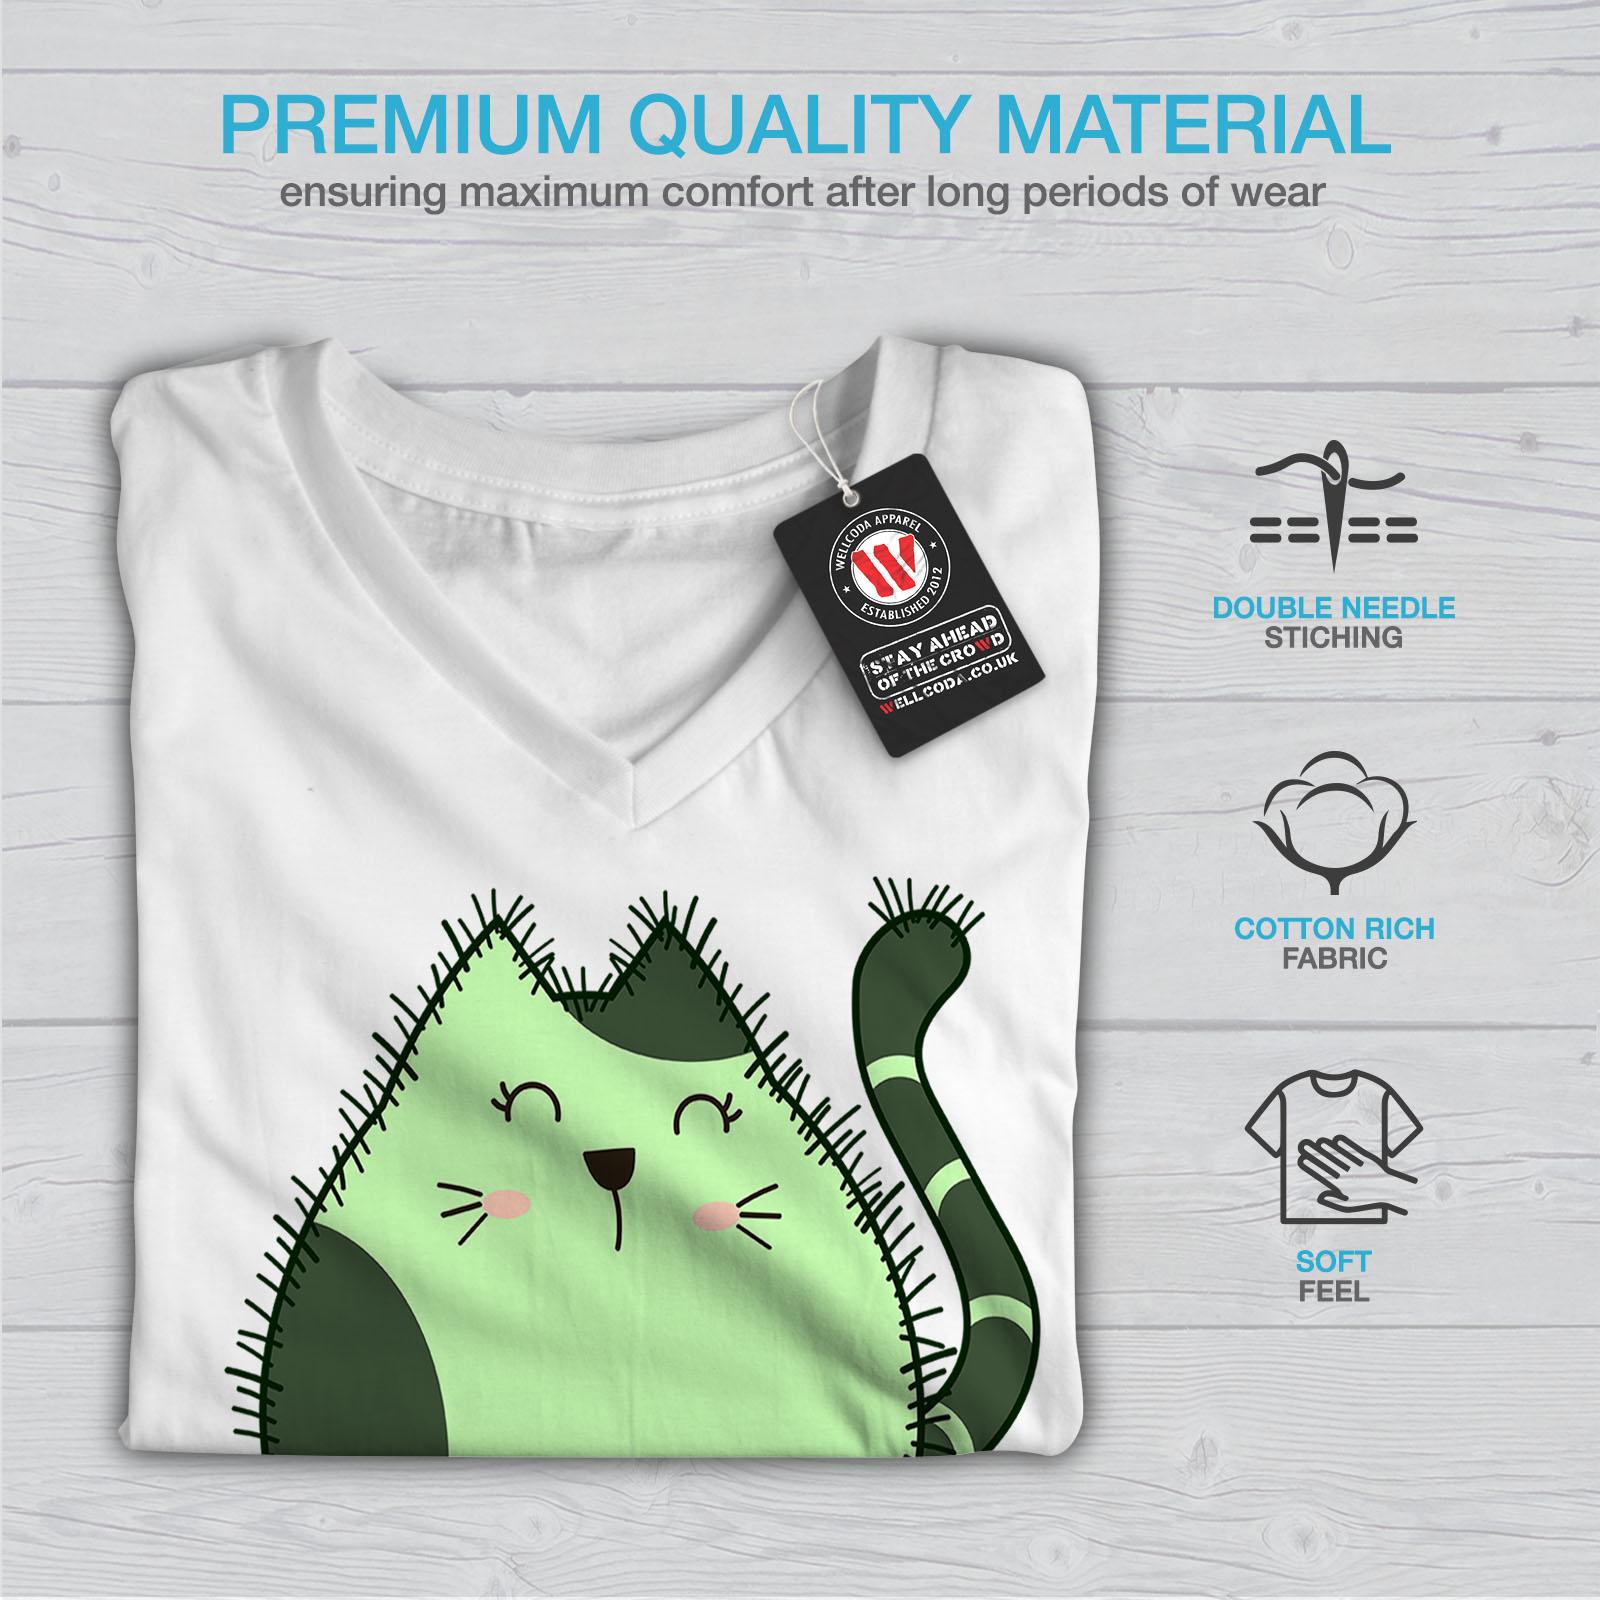 Wellcoda-Cat-Cactus-Womens-V-Neck-T-shirt-Funny-Animal-Graphic-Design-Tee thumbnail 9